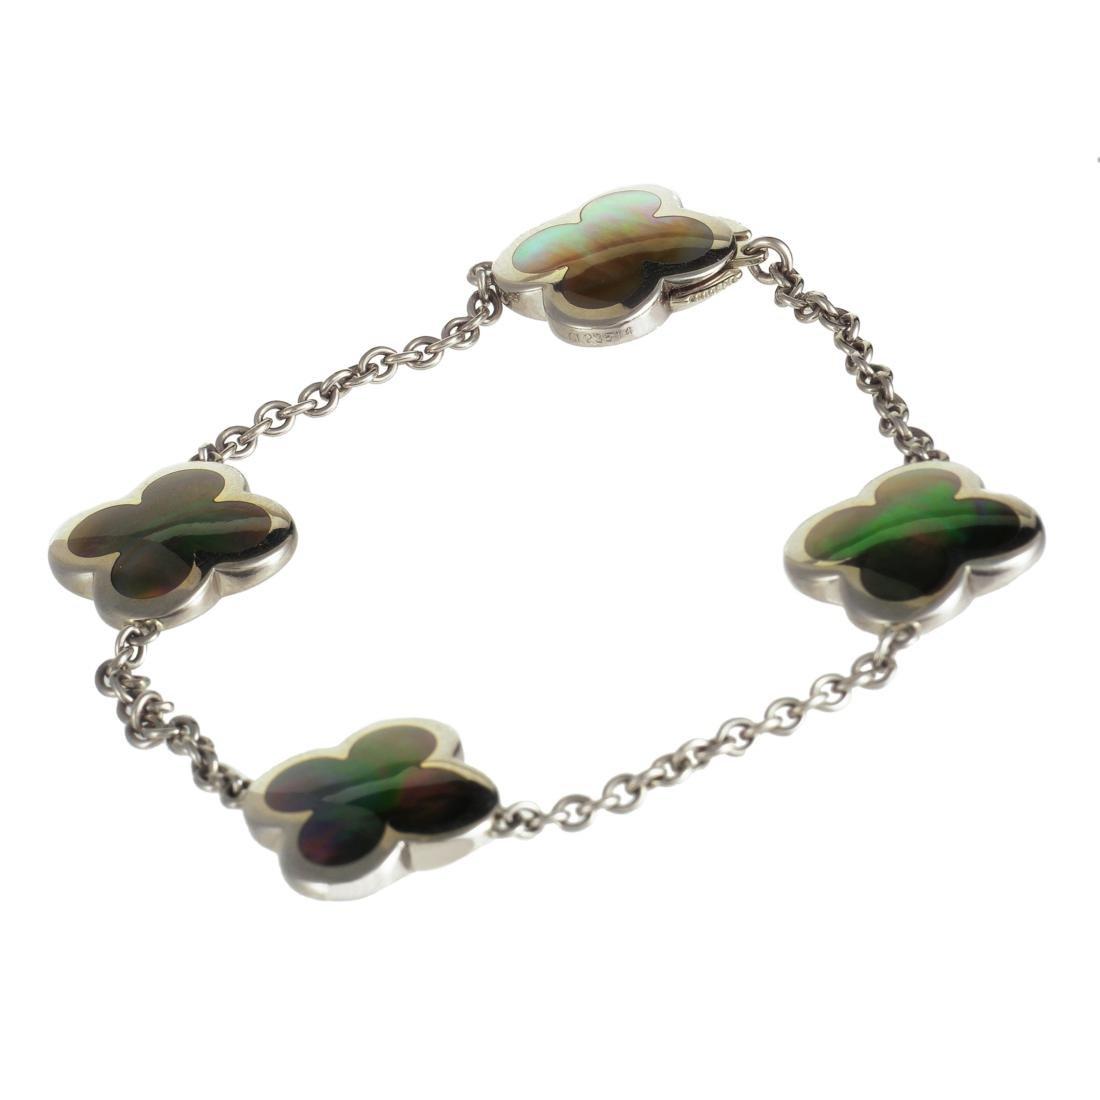 Van Cleef & Arpels Alhambra 18K Black MOP Bracelet